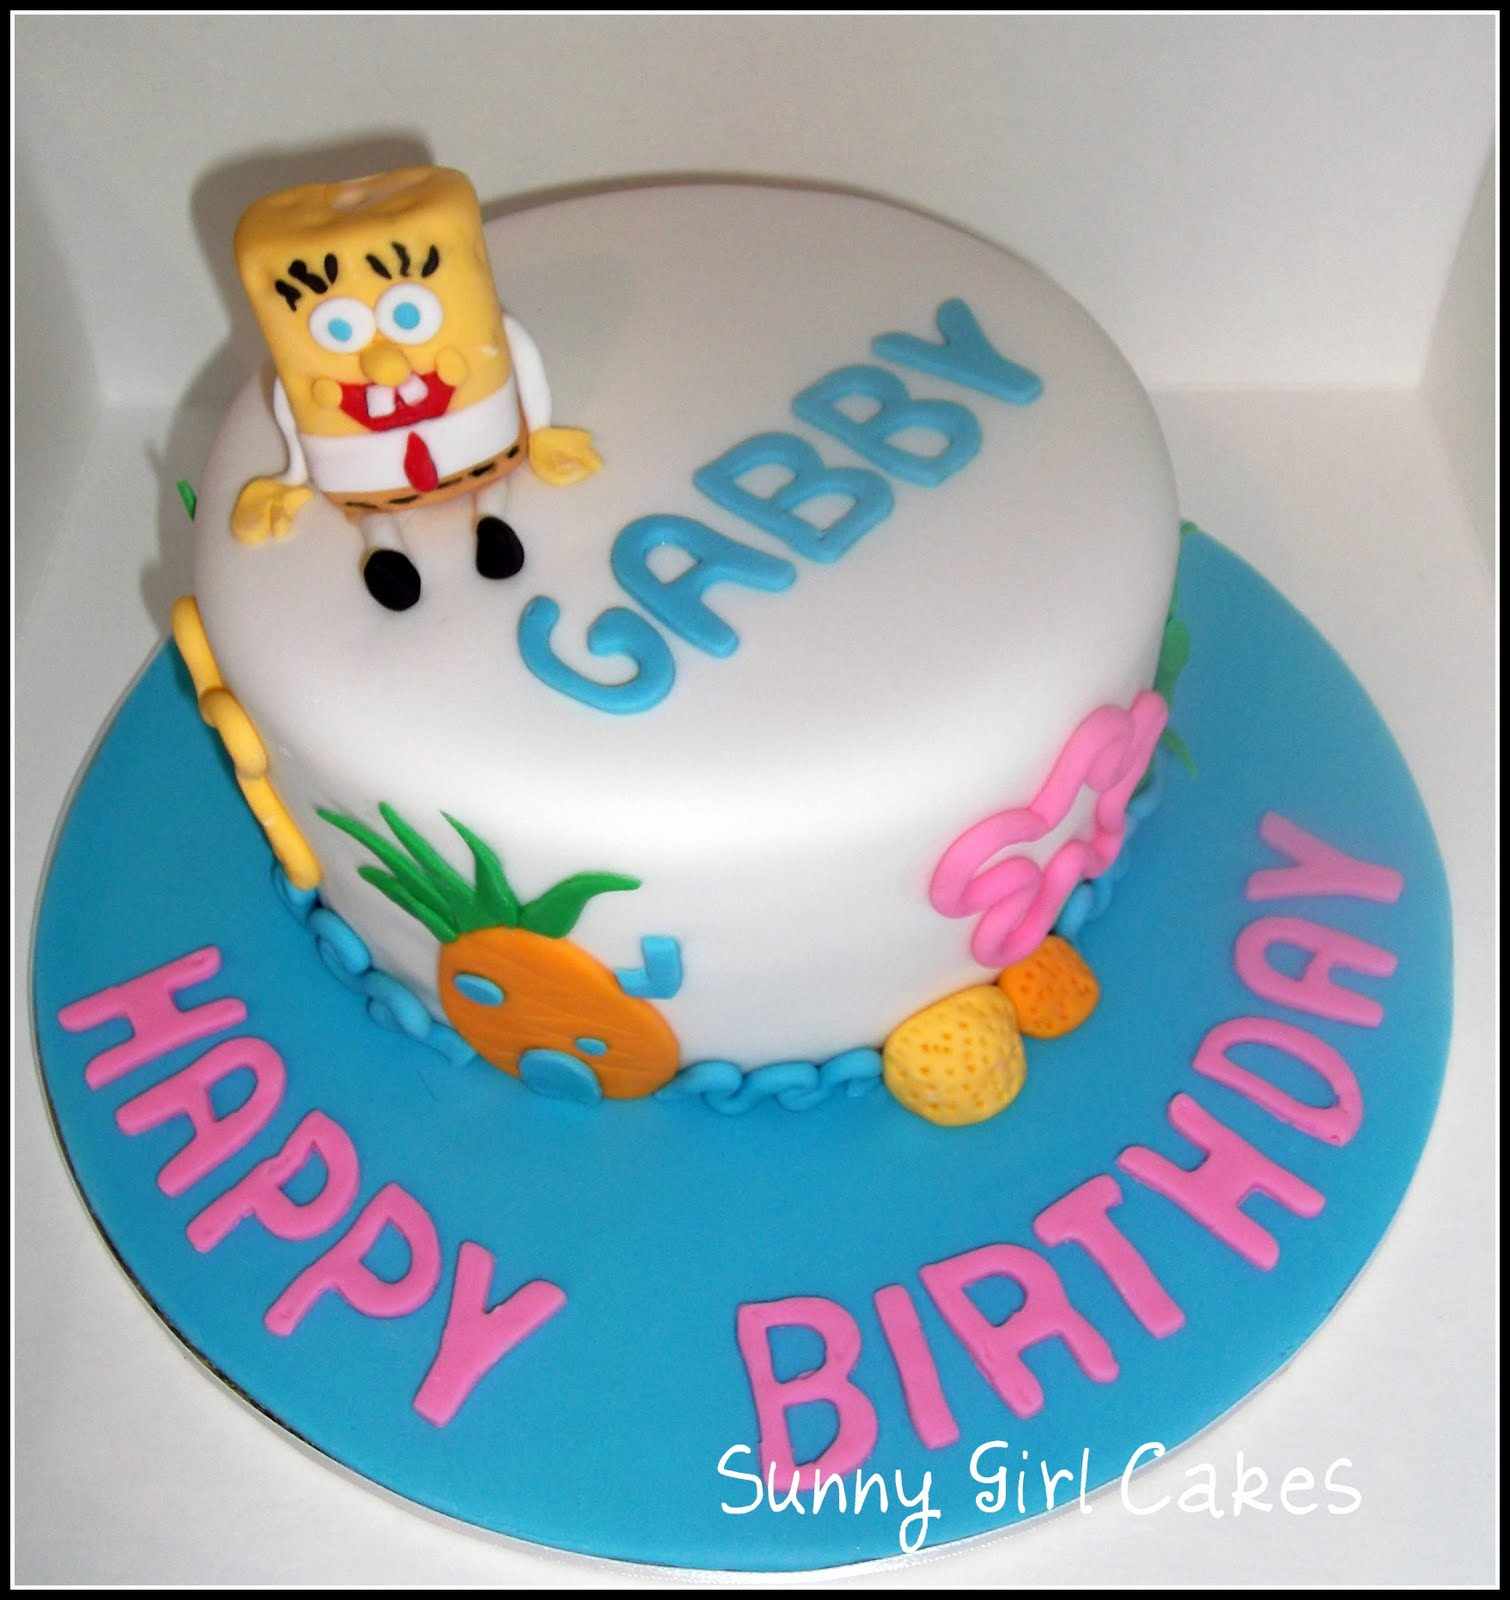 Allergy Free Cakes